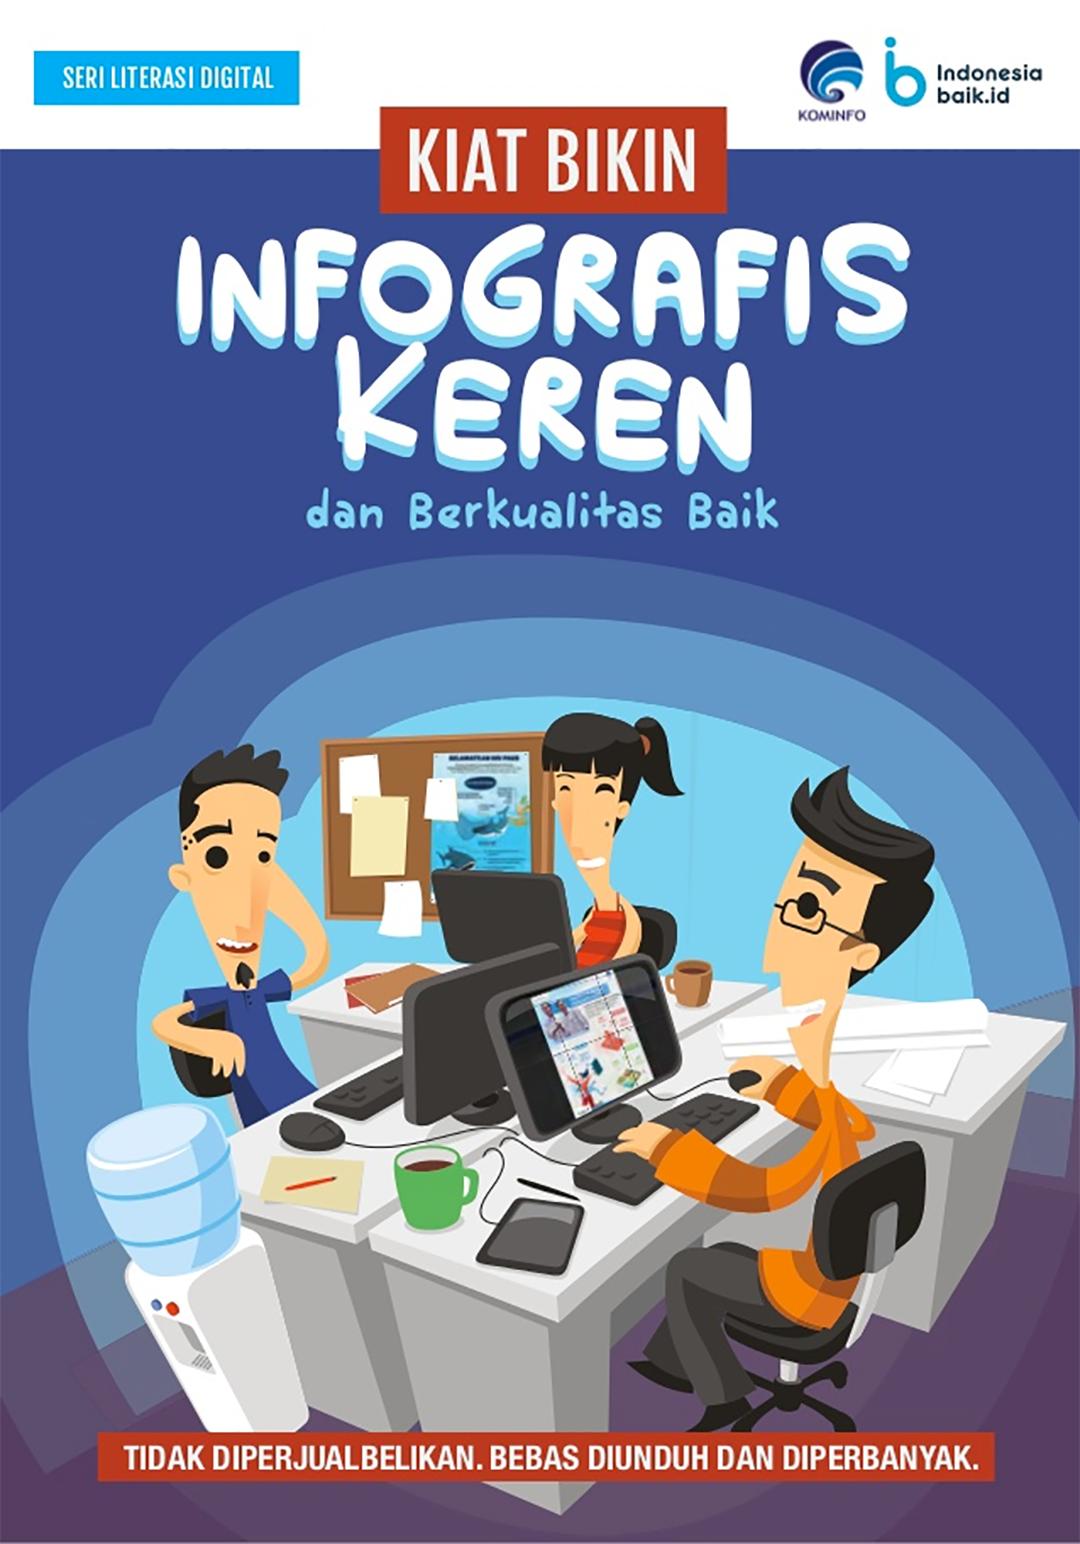 Kiat Bikin Infografis Keren dan Berkualitas Baik